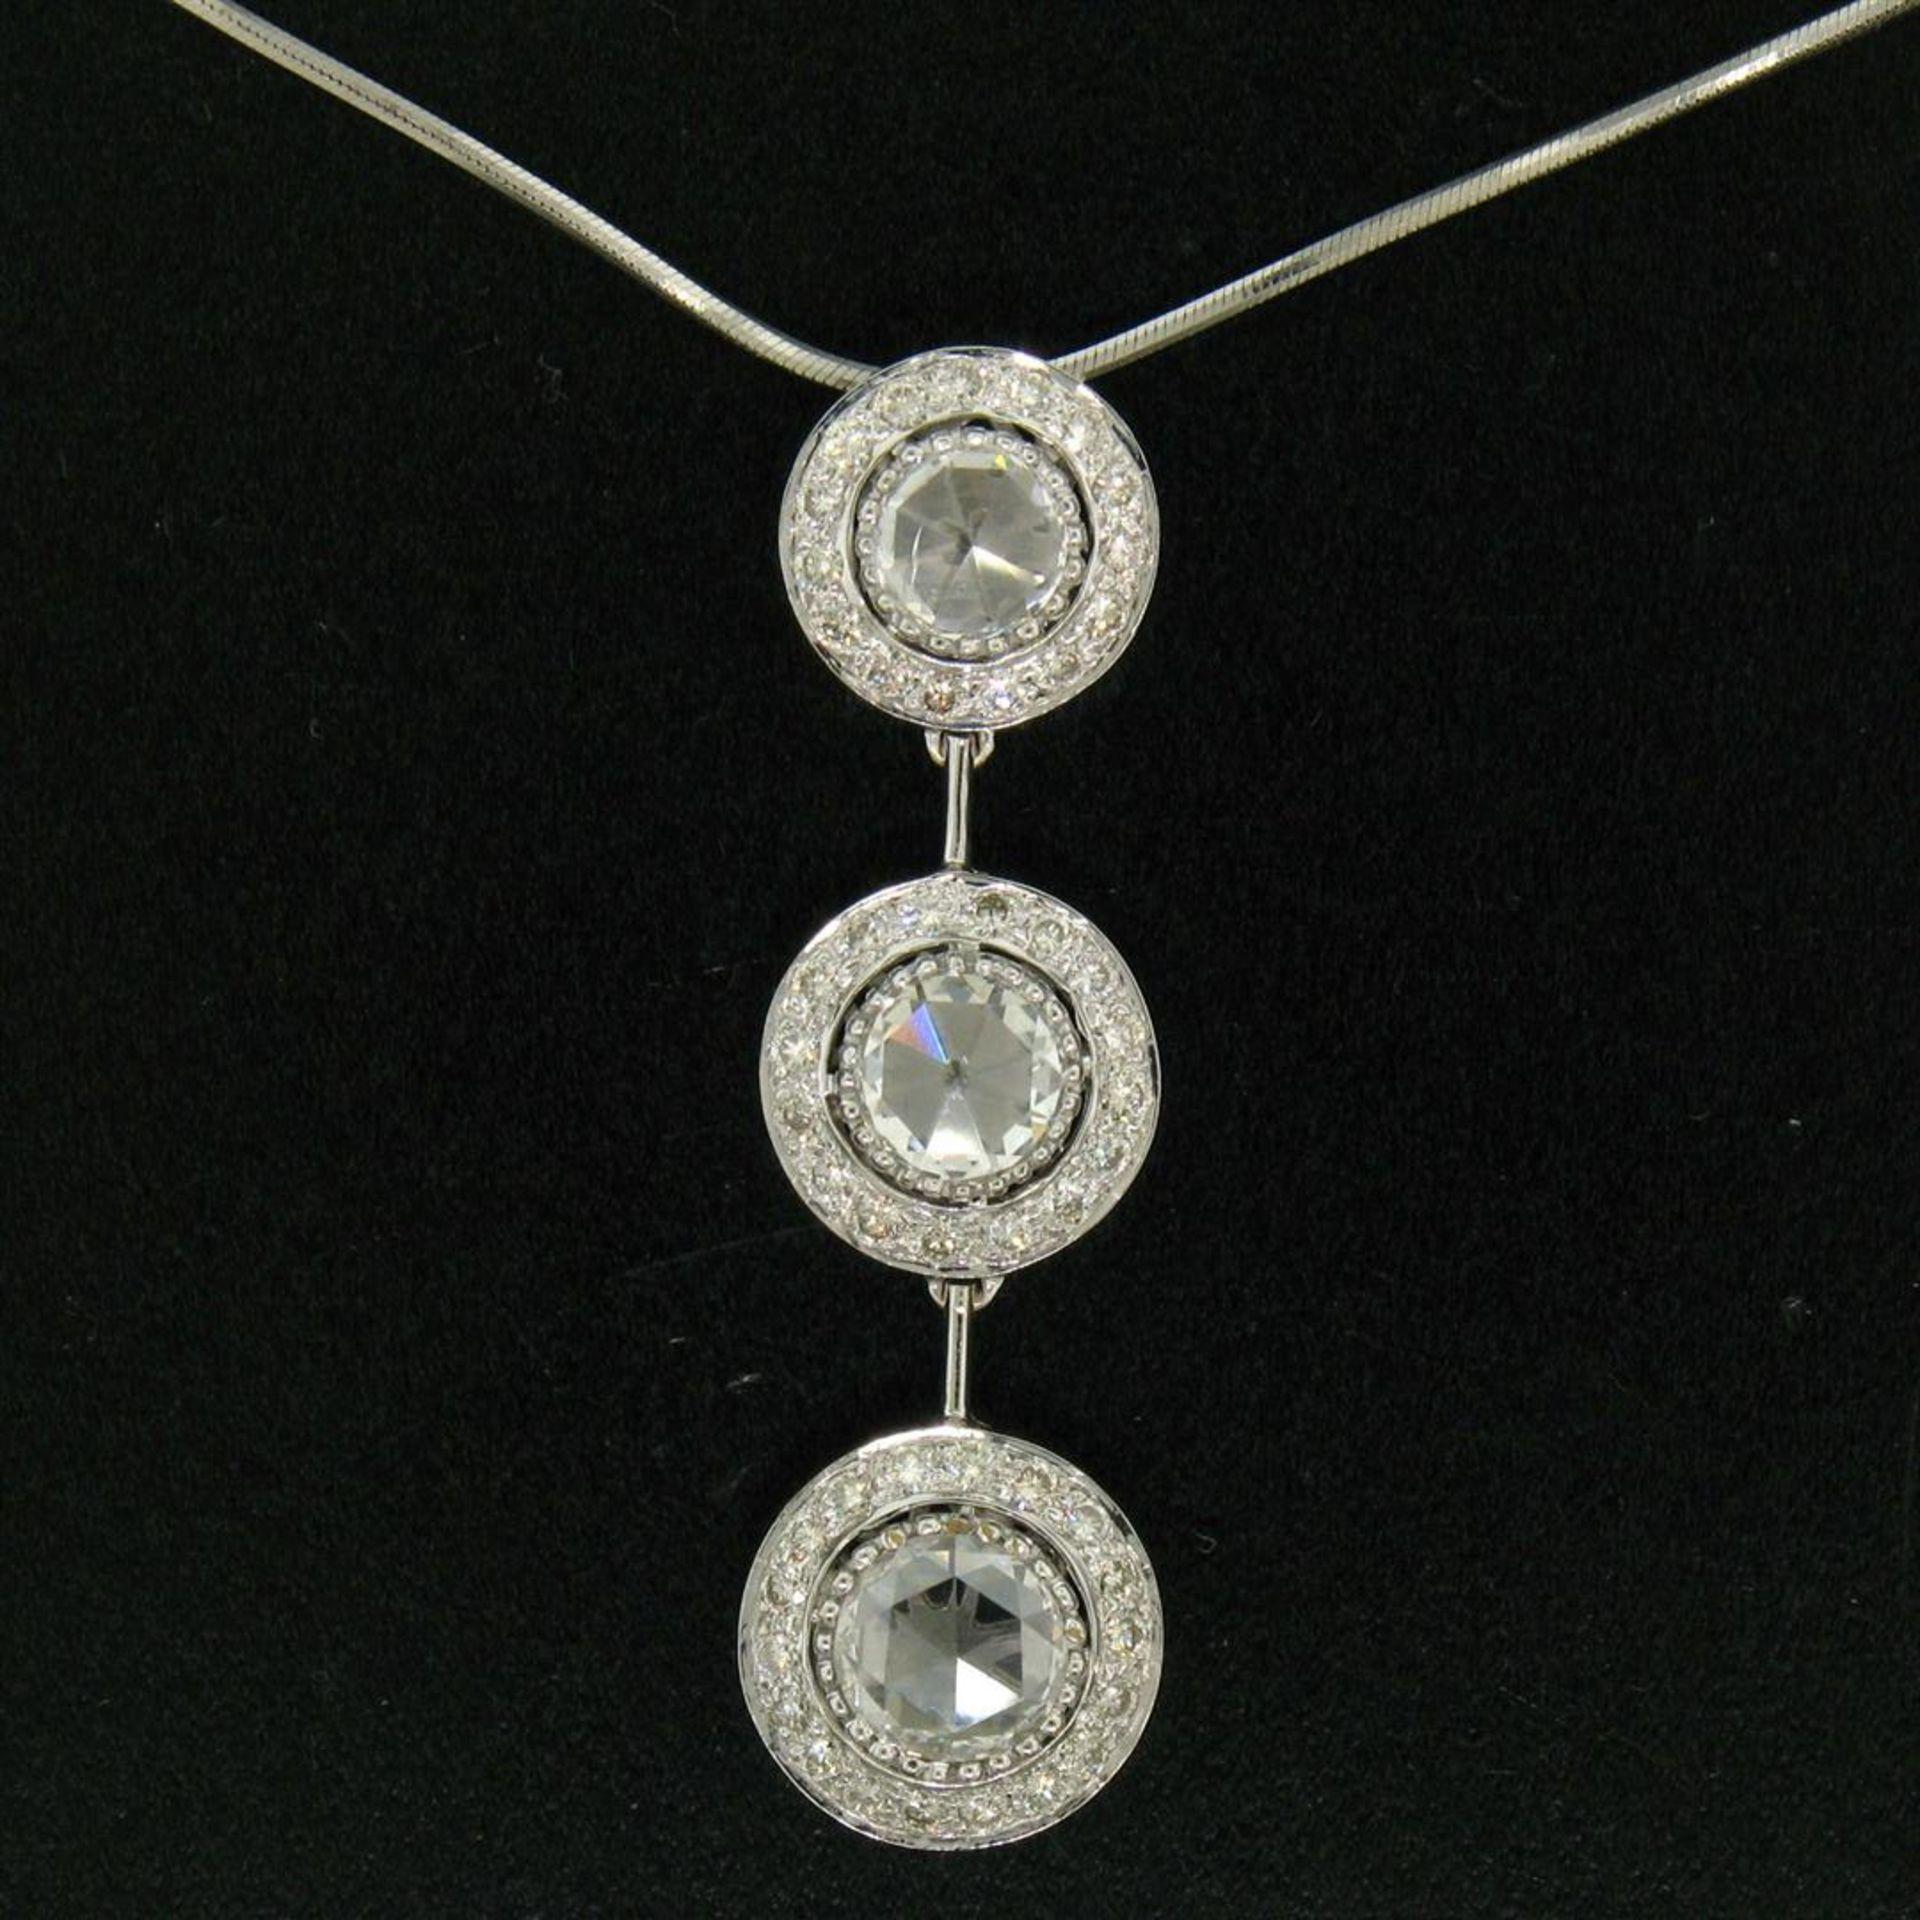 Vintage 18K White Gold 2.59 ctw 3 Rose Cut Diamond Drop Pendant w/ Triple Halo - Image 2 of 9